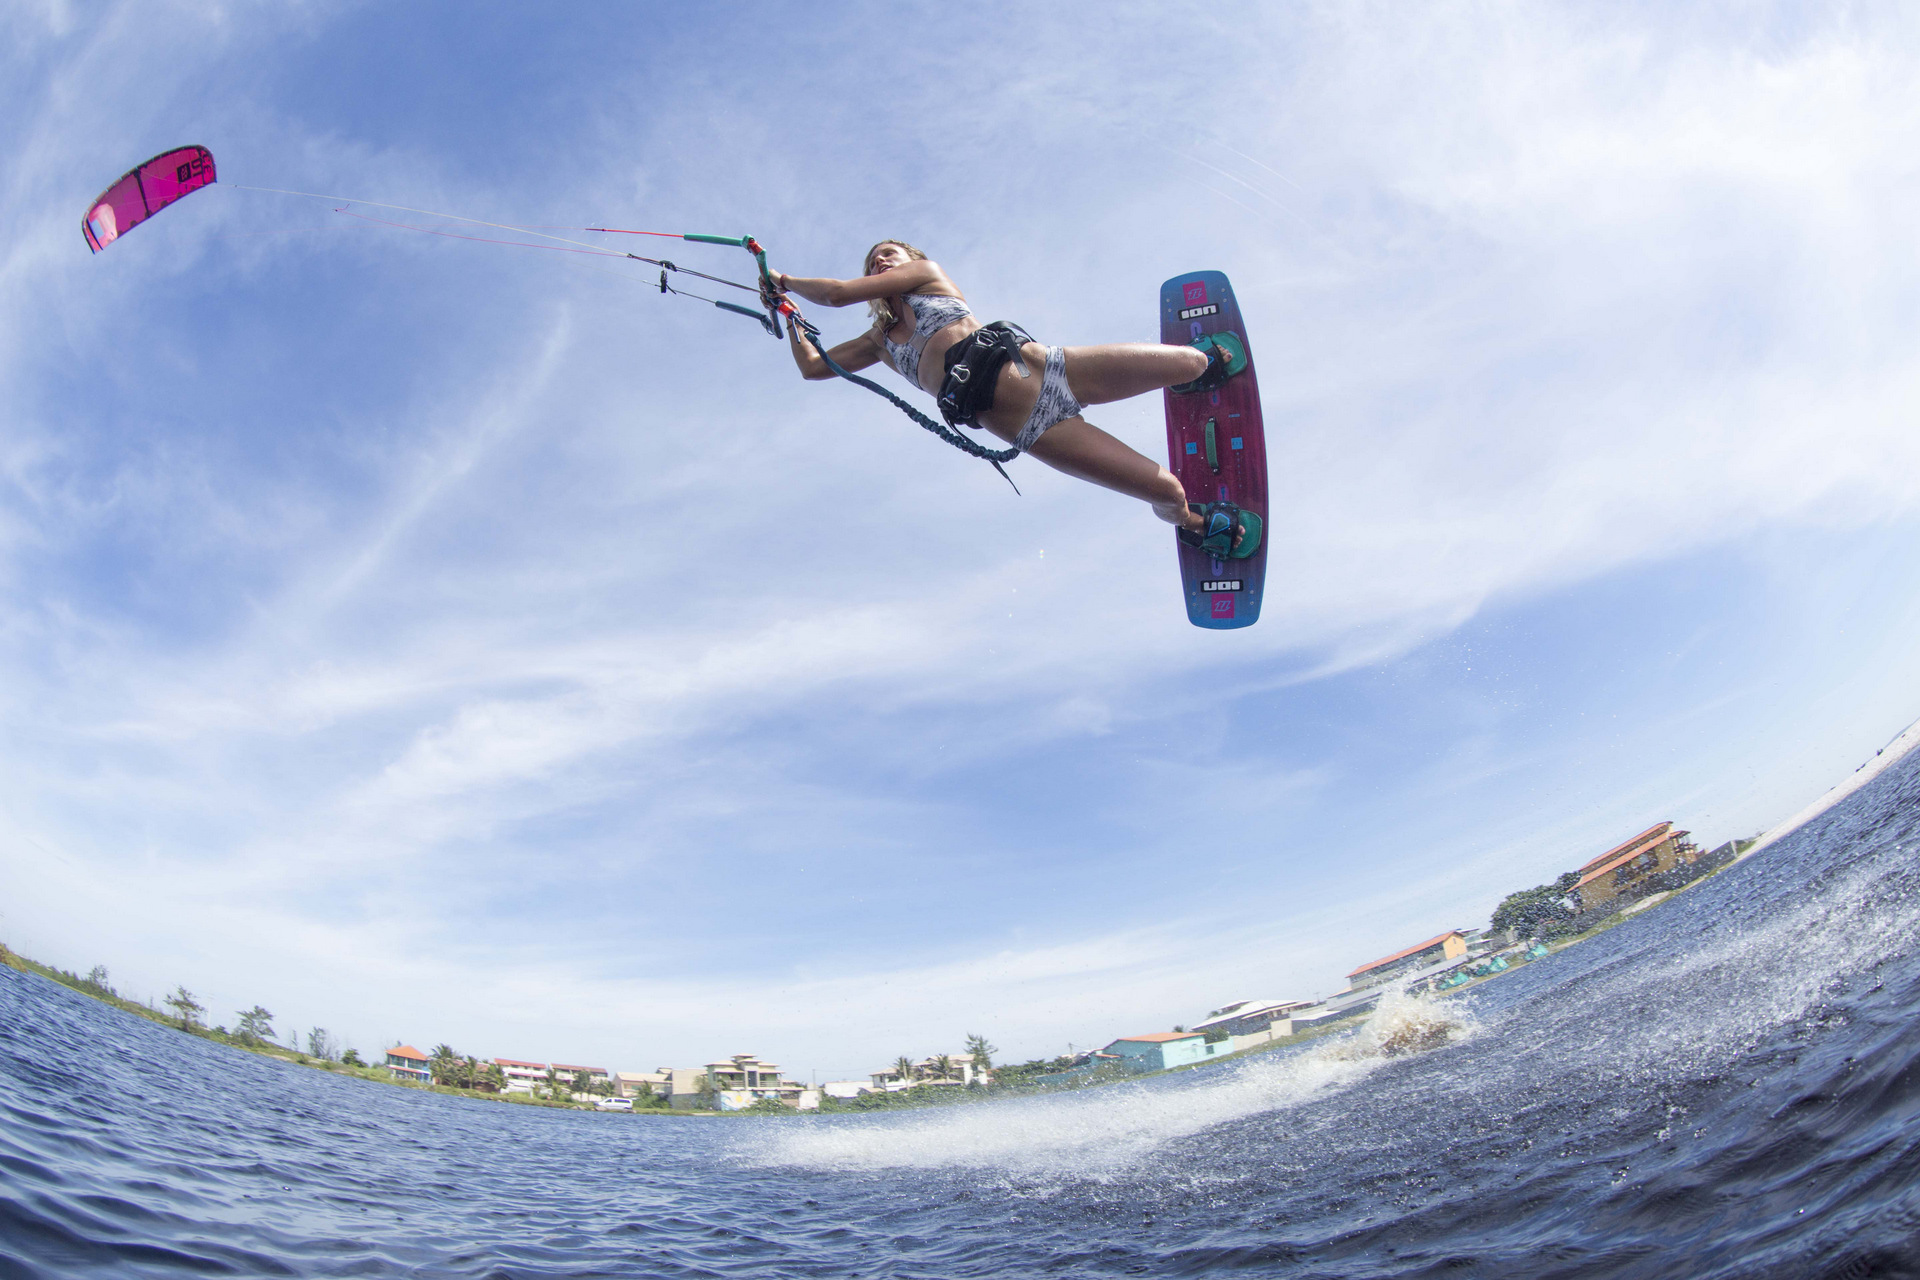 miedzyzdroje-kitesurfing-kurs